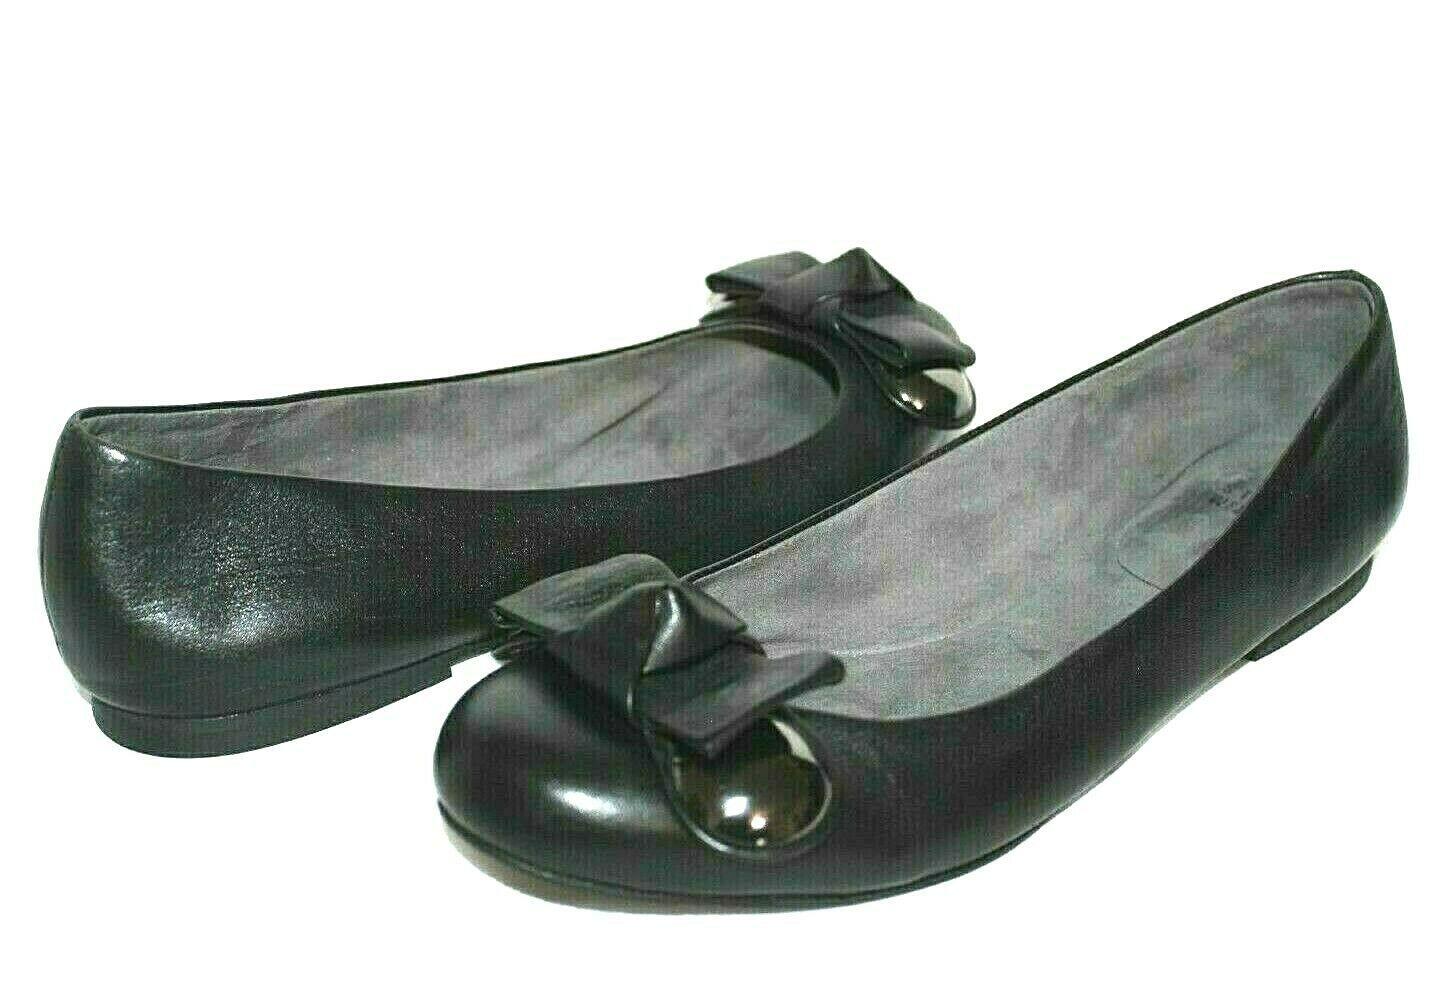 ❤️ STUART WEITZMAN Buono Bow Black Nappa Leather Flats 9 M GREAT! L@@K!23 - $34.19